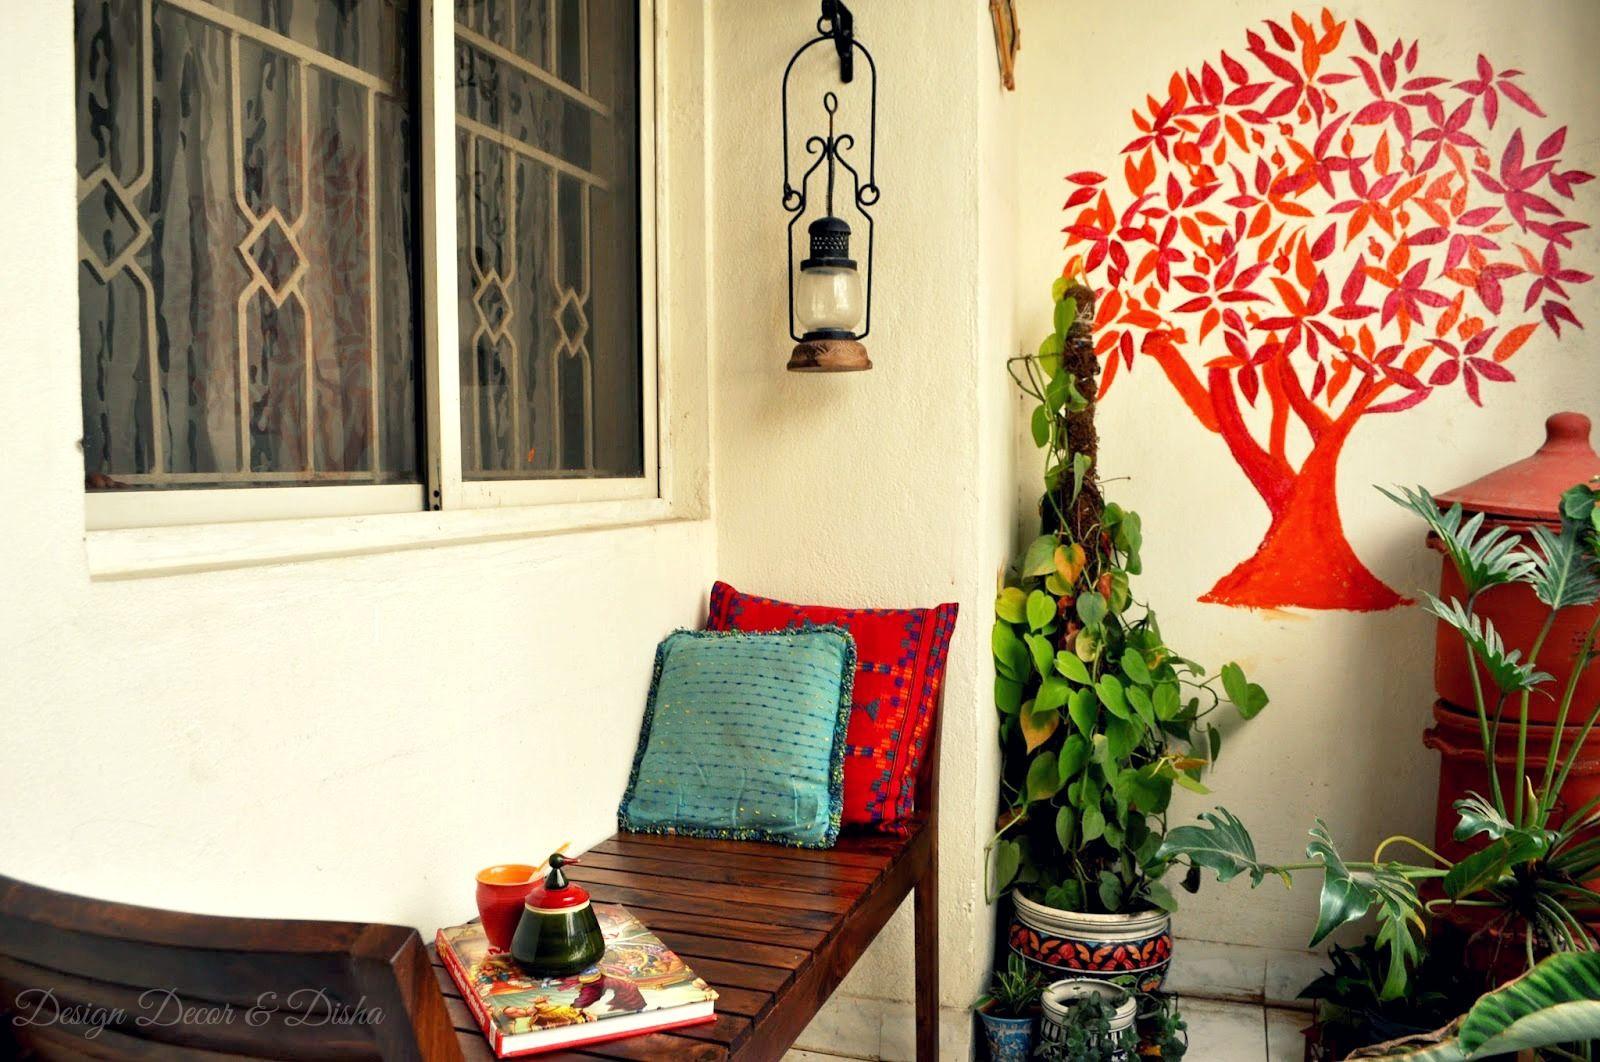 Balcony+Garden+Decor.jpg (1600×1062)   Balcony garden   Pinterest ...